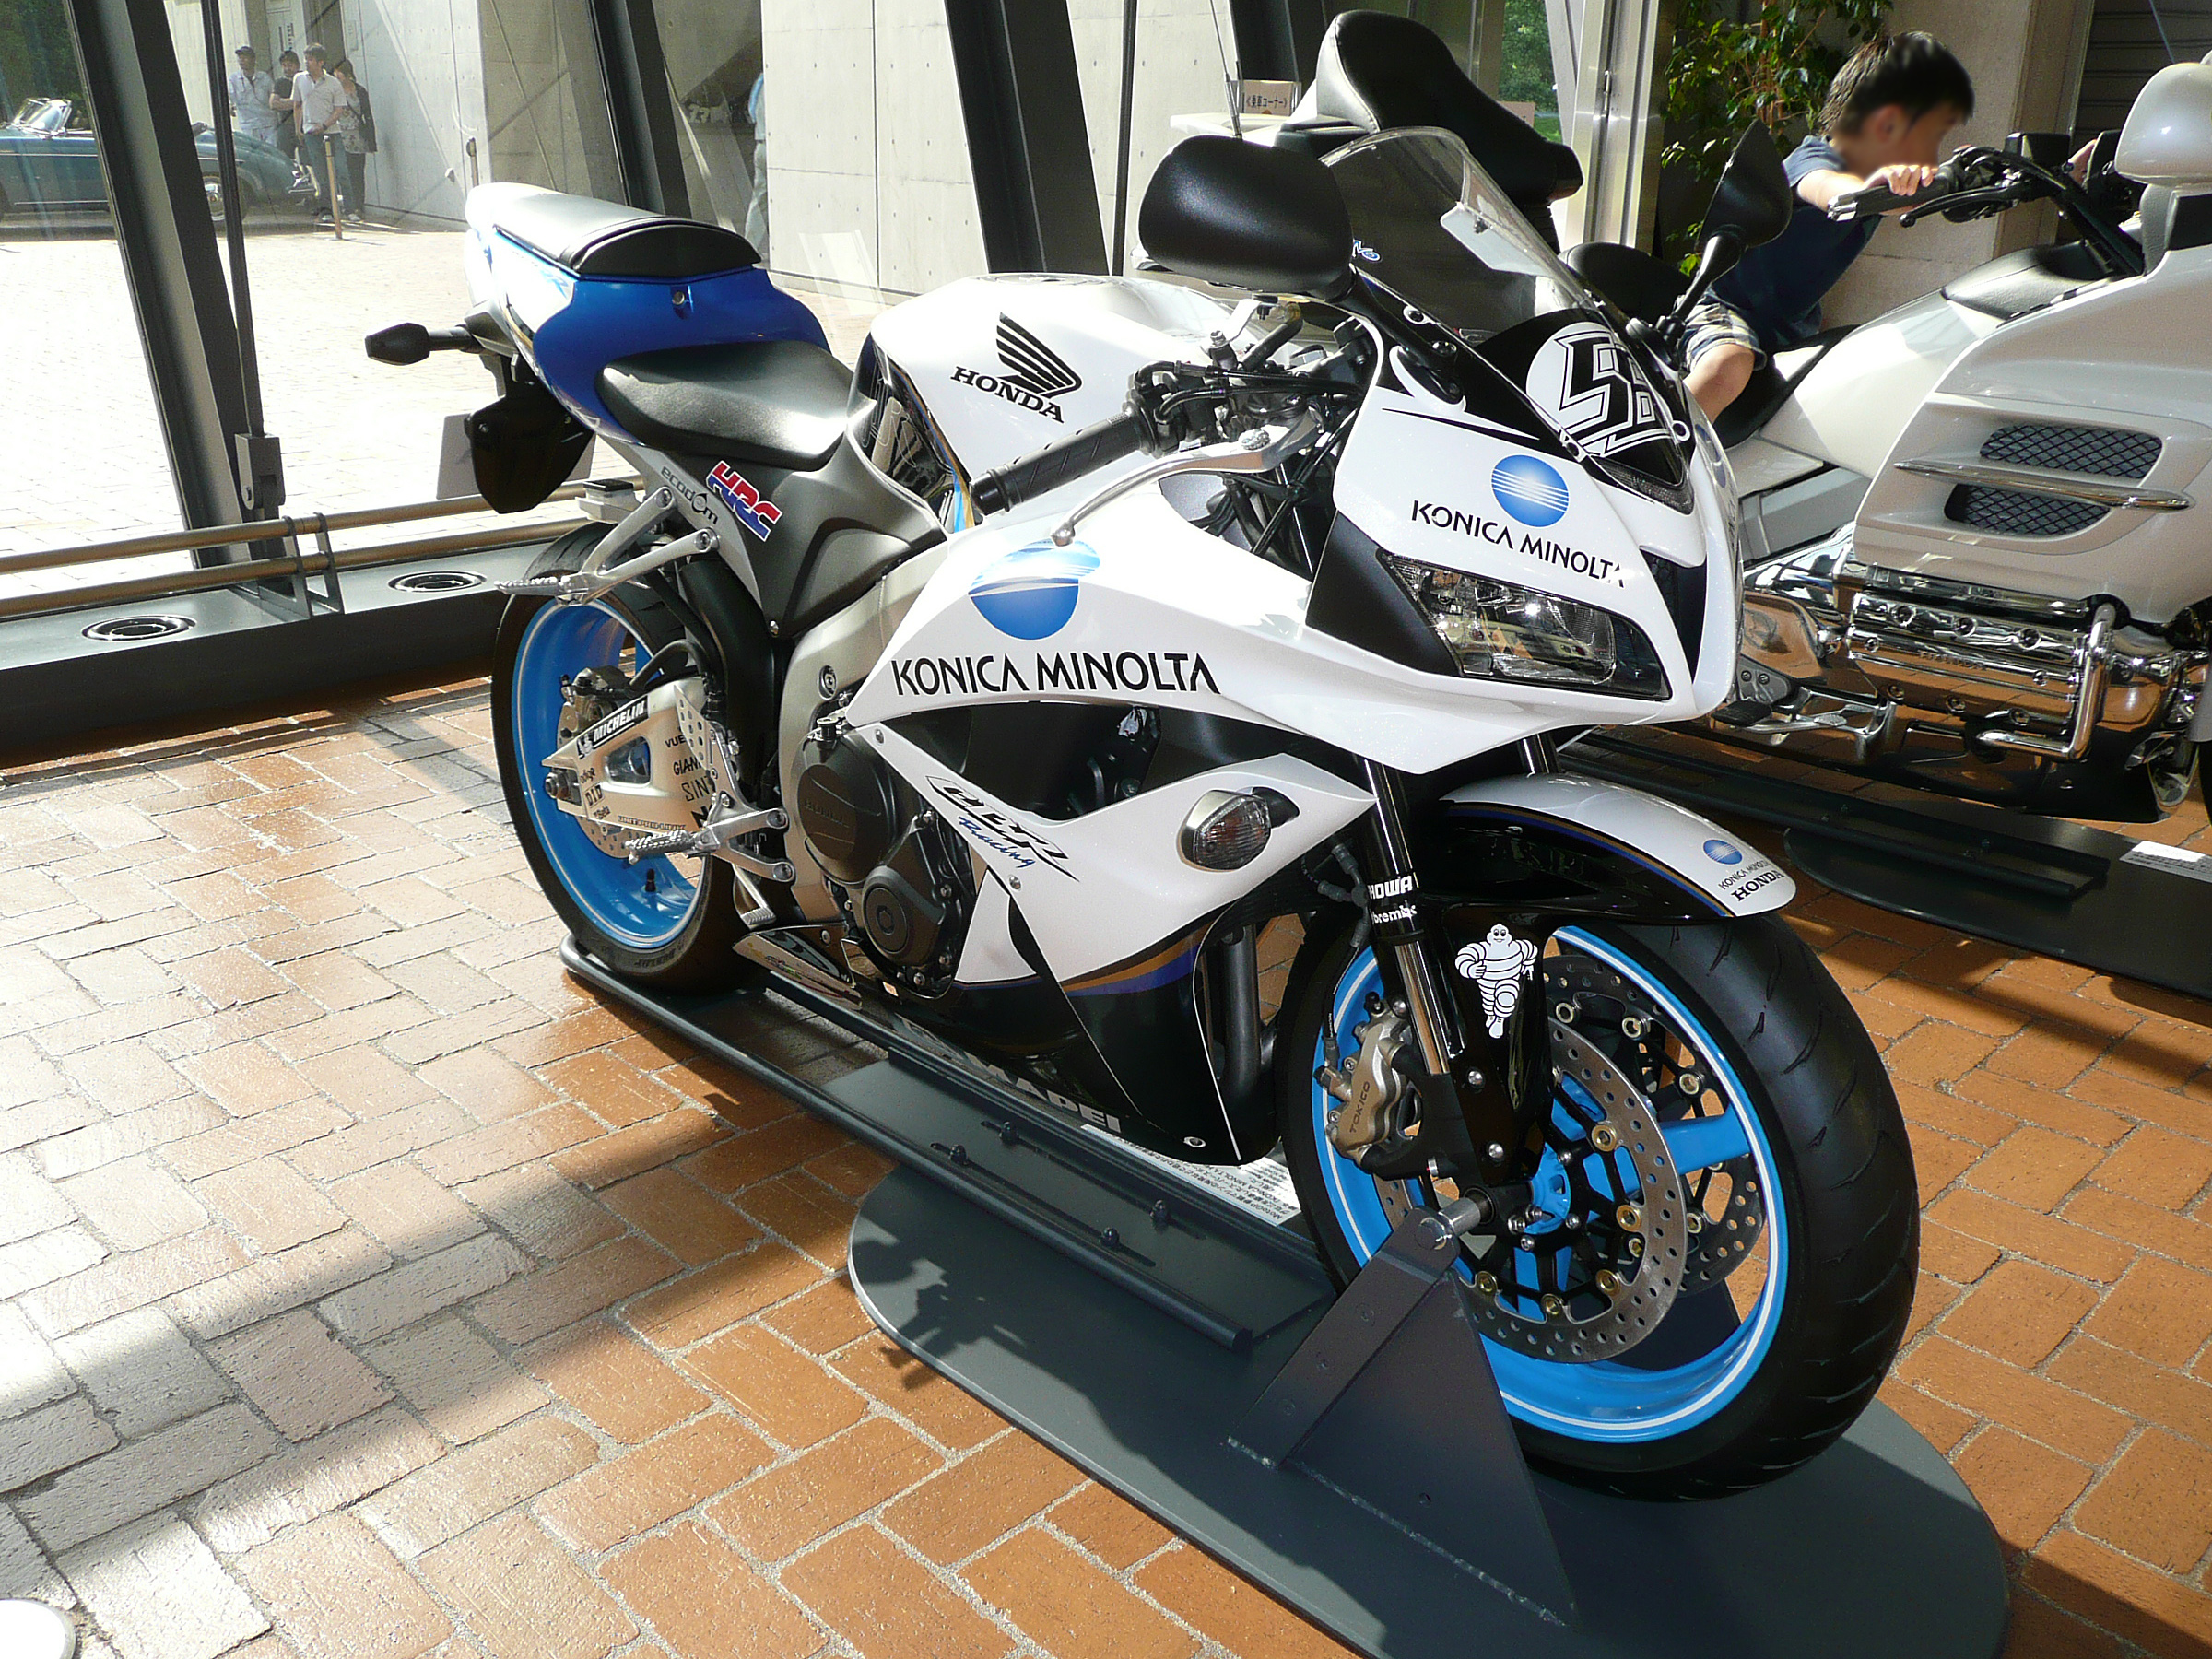 File:2008 Honda CBR600RR Konica Minolta Special Edition